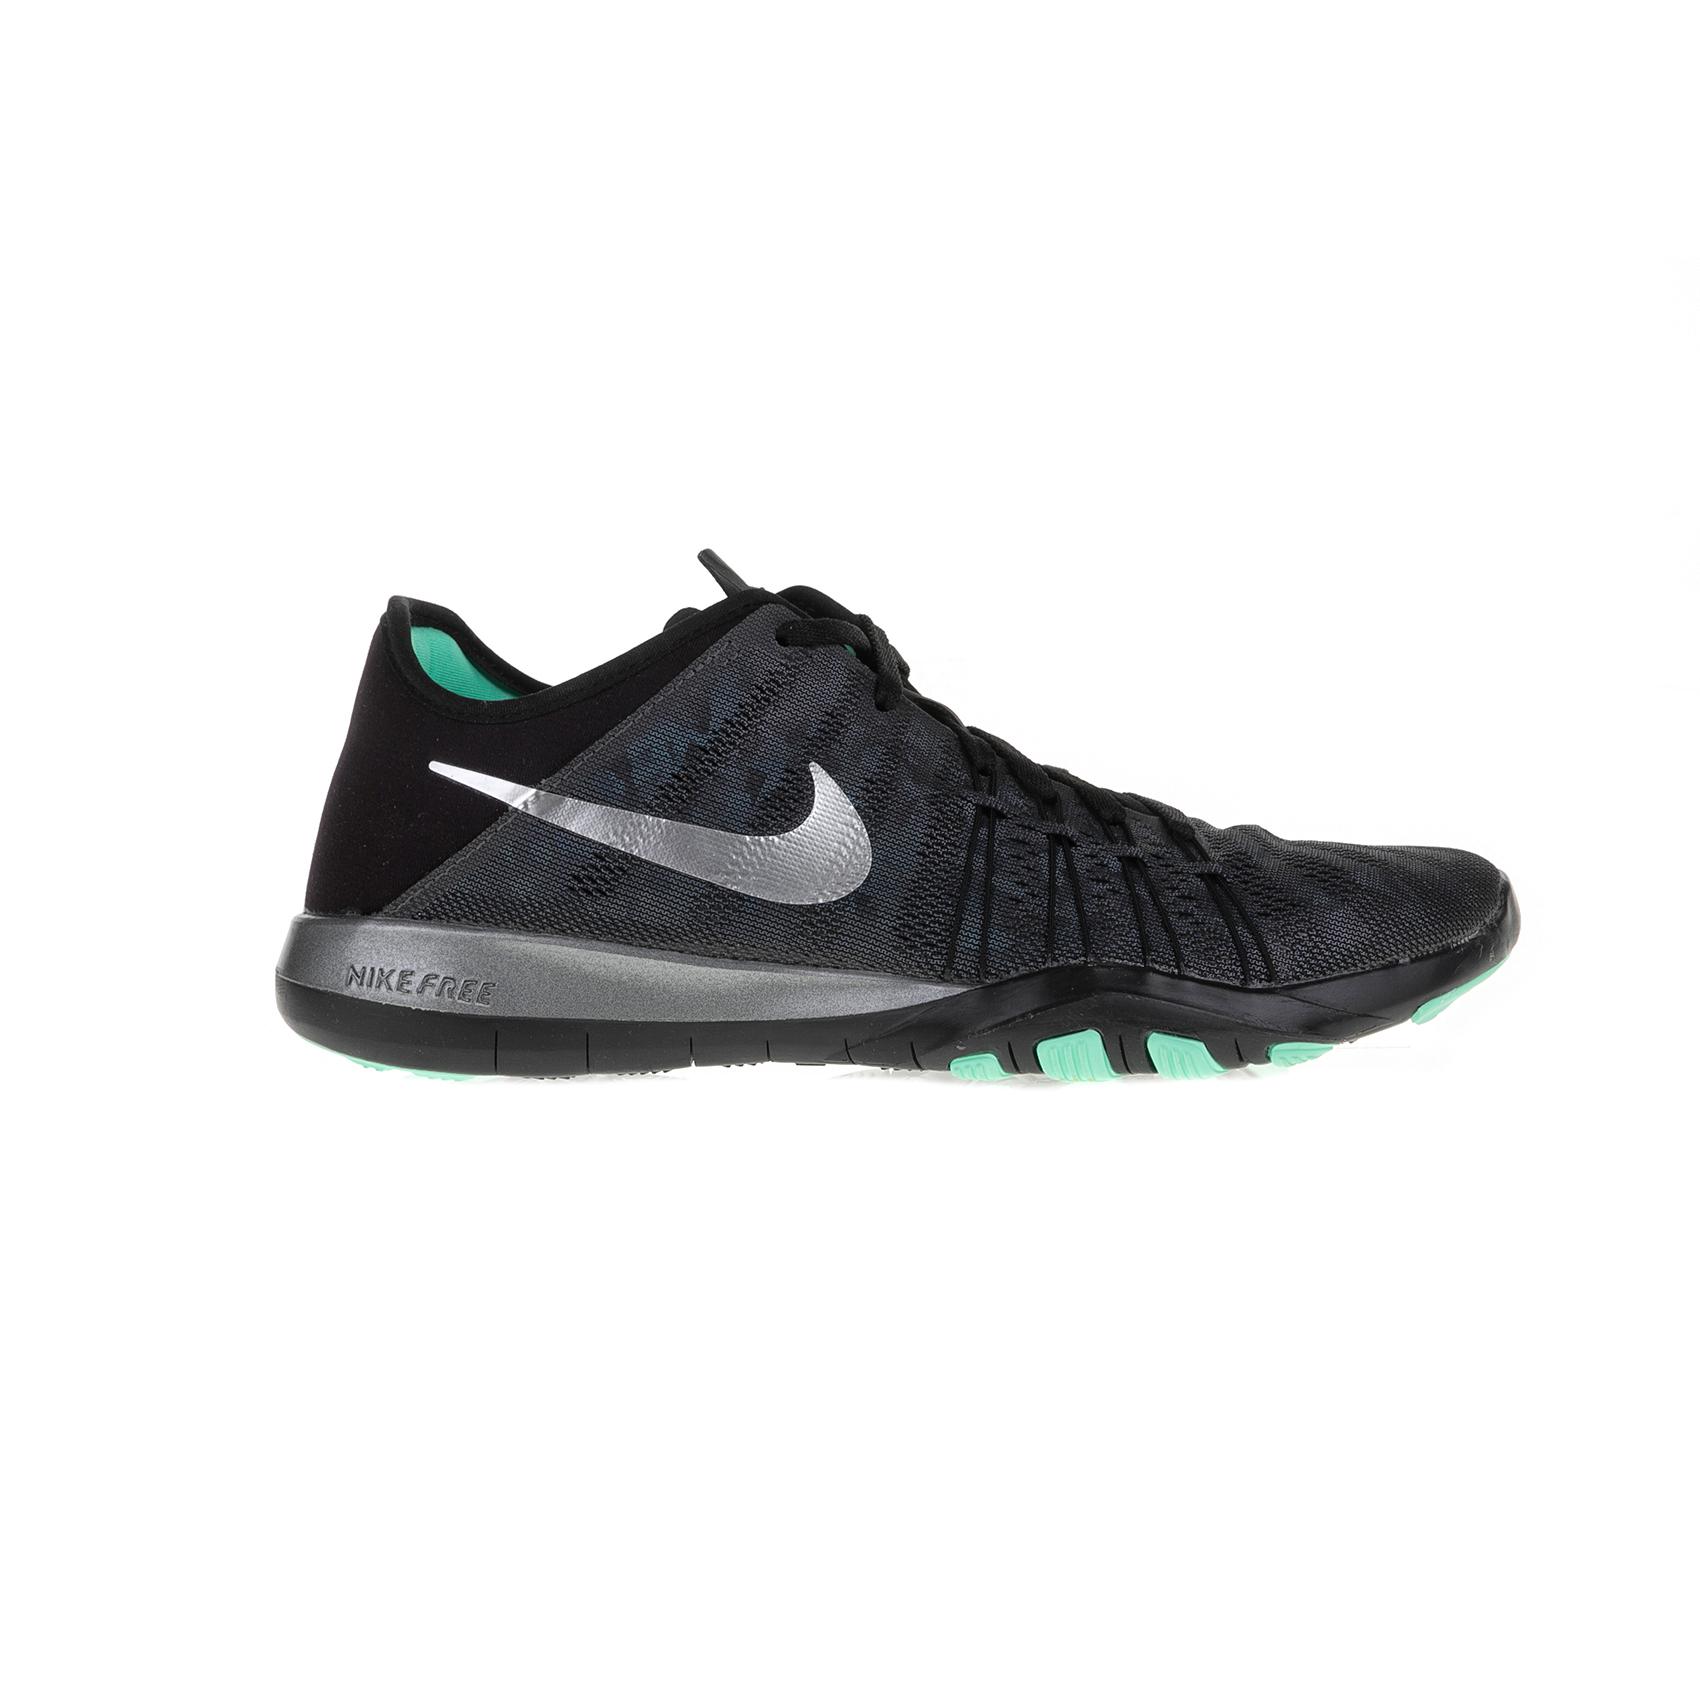 NIKE – Γυναικεία αθλητικά παπούτσια NIKE FREE TR 6 MTLC μαύρα